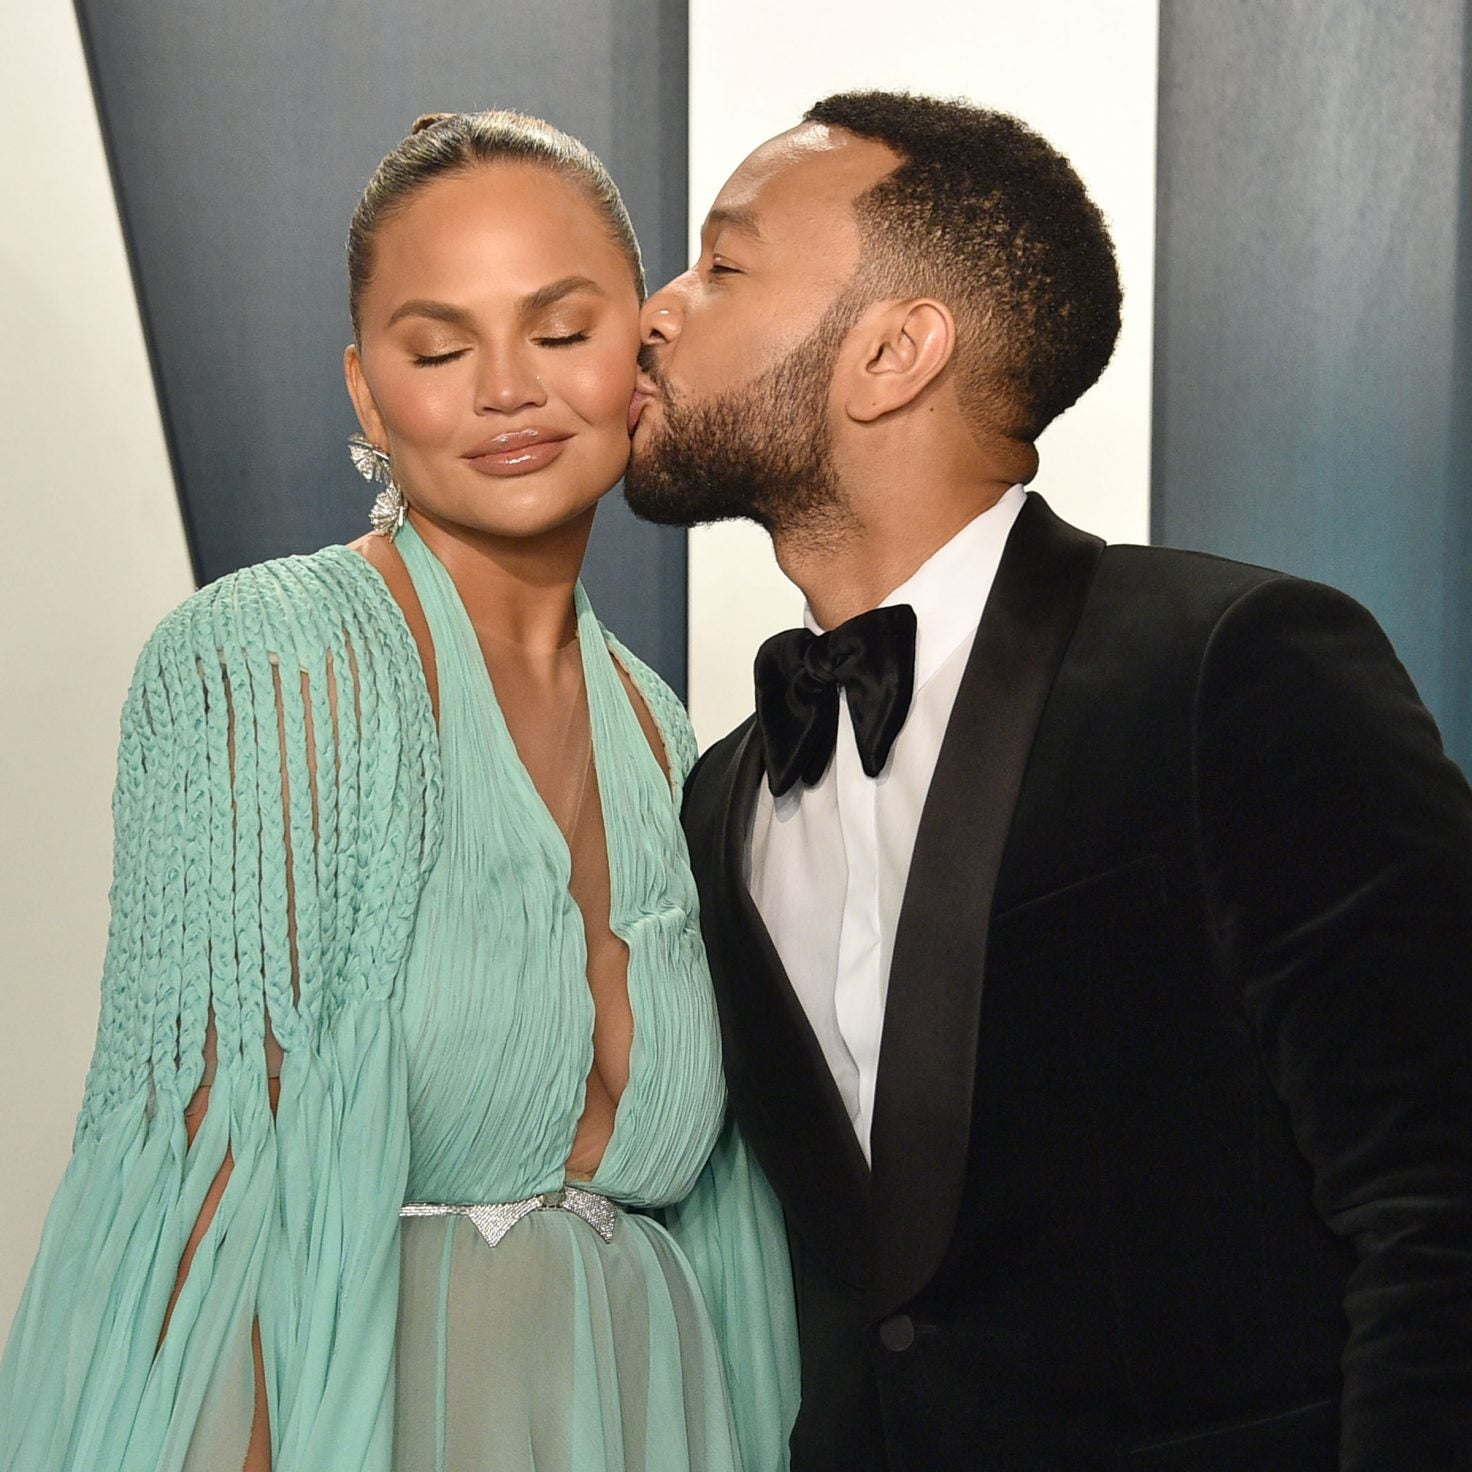 John Legend Performs Emotional Tribute To Wife Chrissy Teigen At Billboard Music Awards